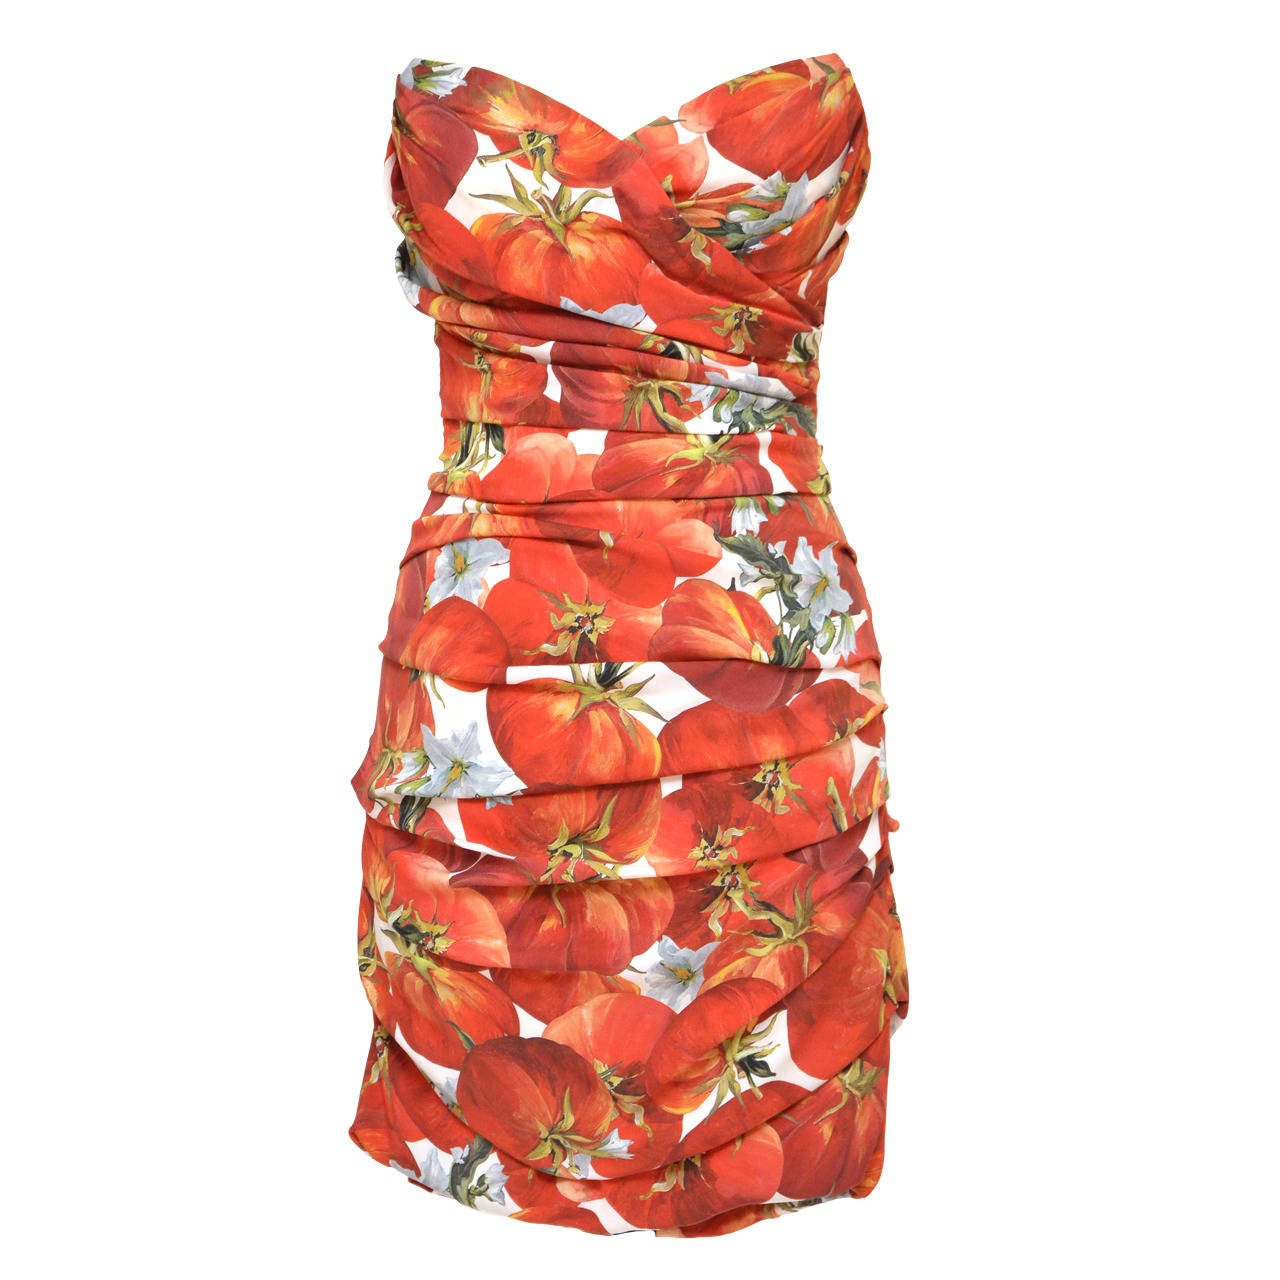 Dolce & Gabbana  Tomato Print Silk Dress For Sale